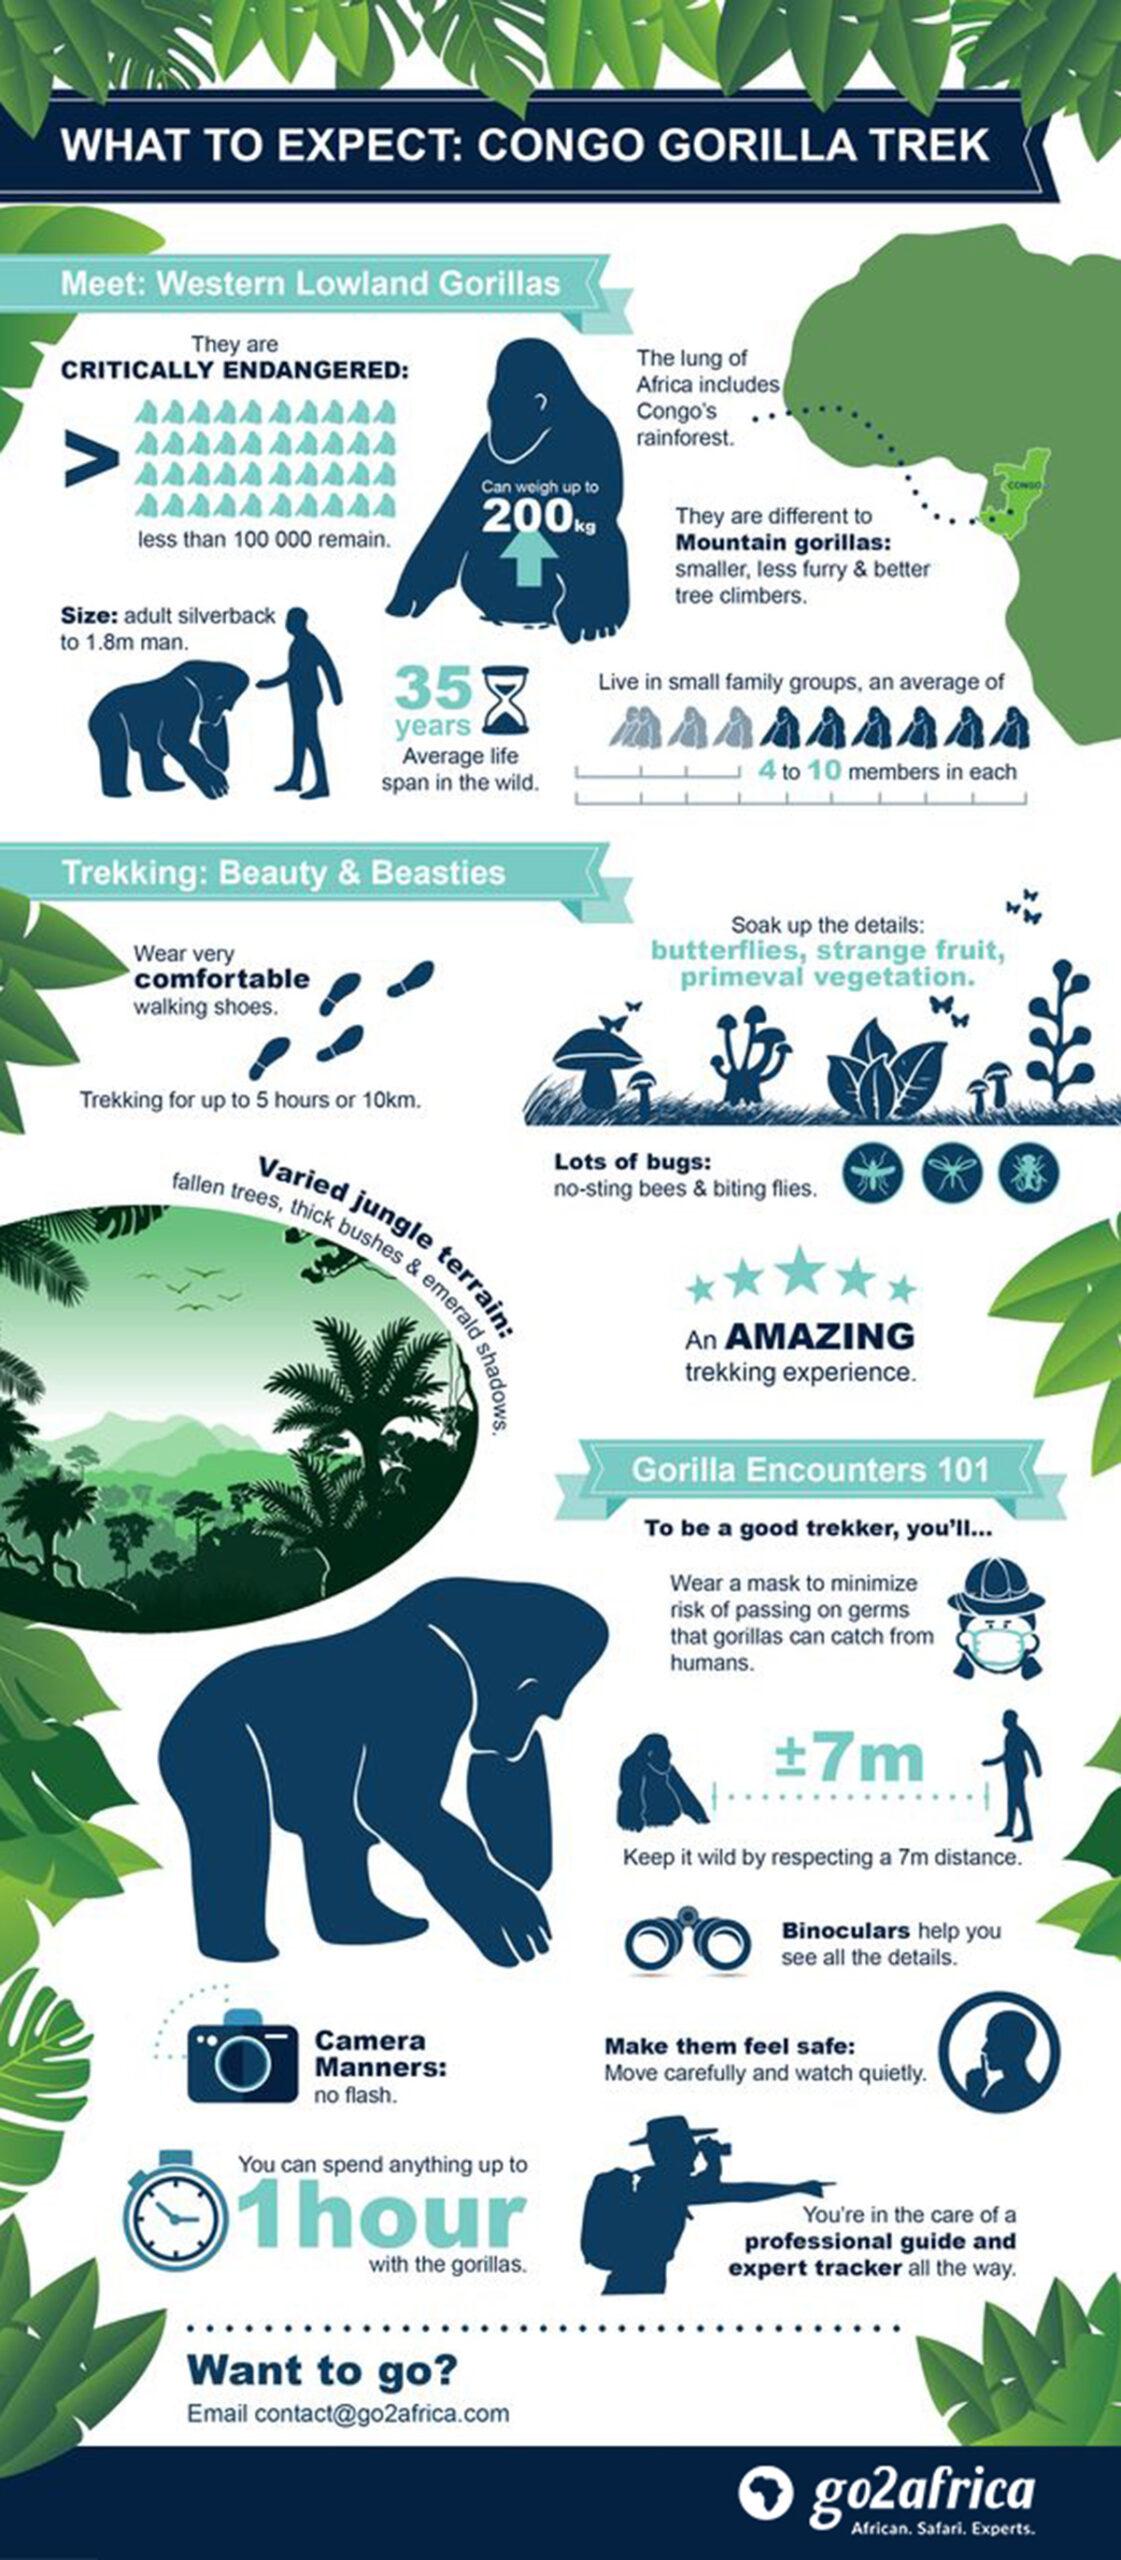 Infographic on gorilla trekking in the Congo (DRC) - Go2Africa